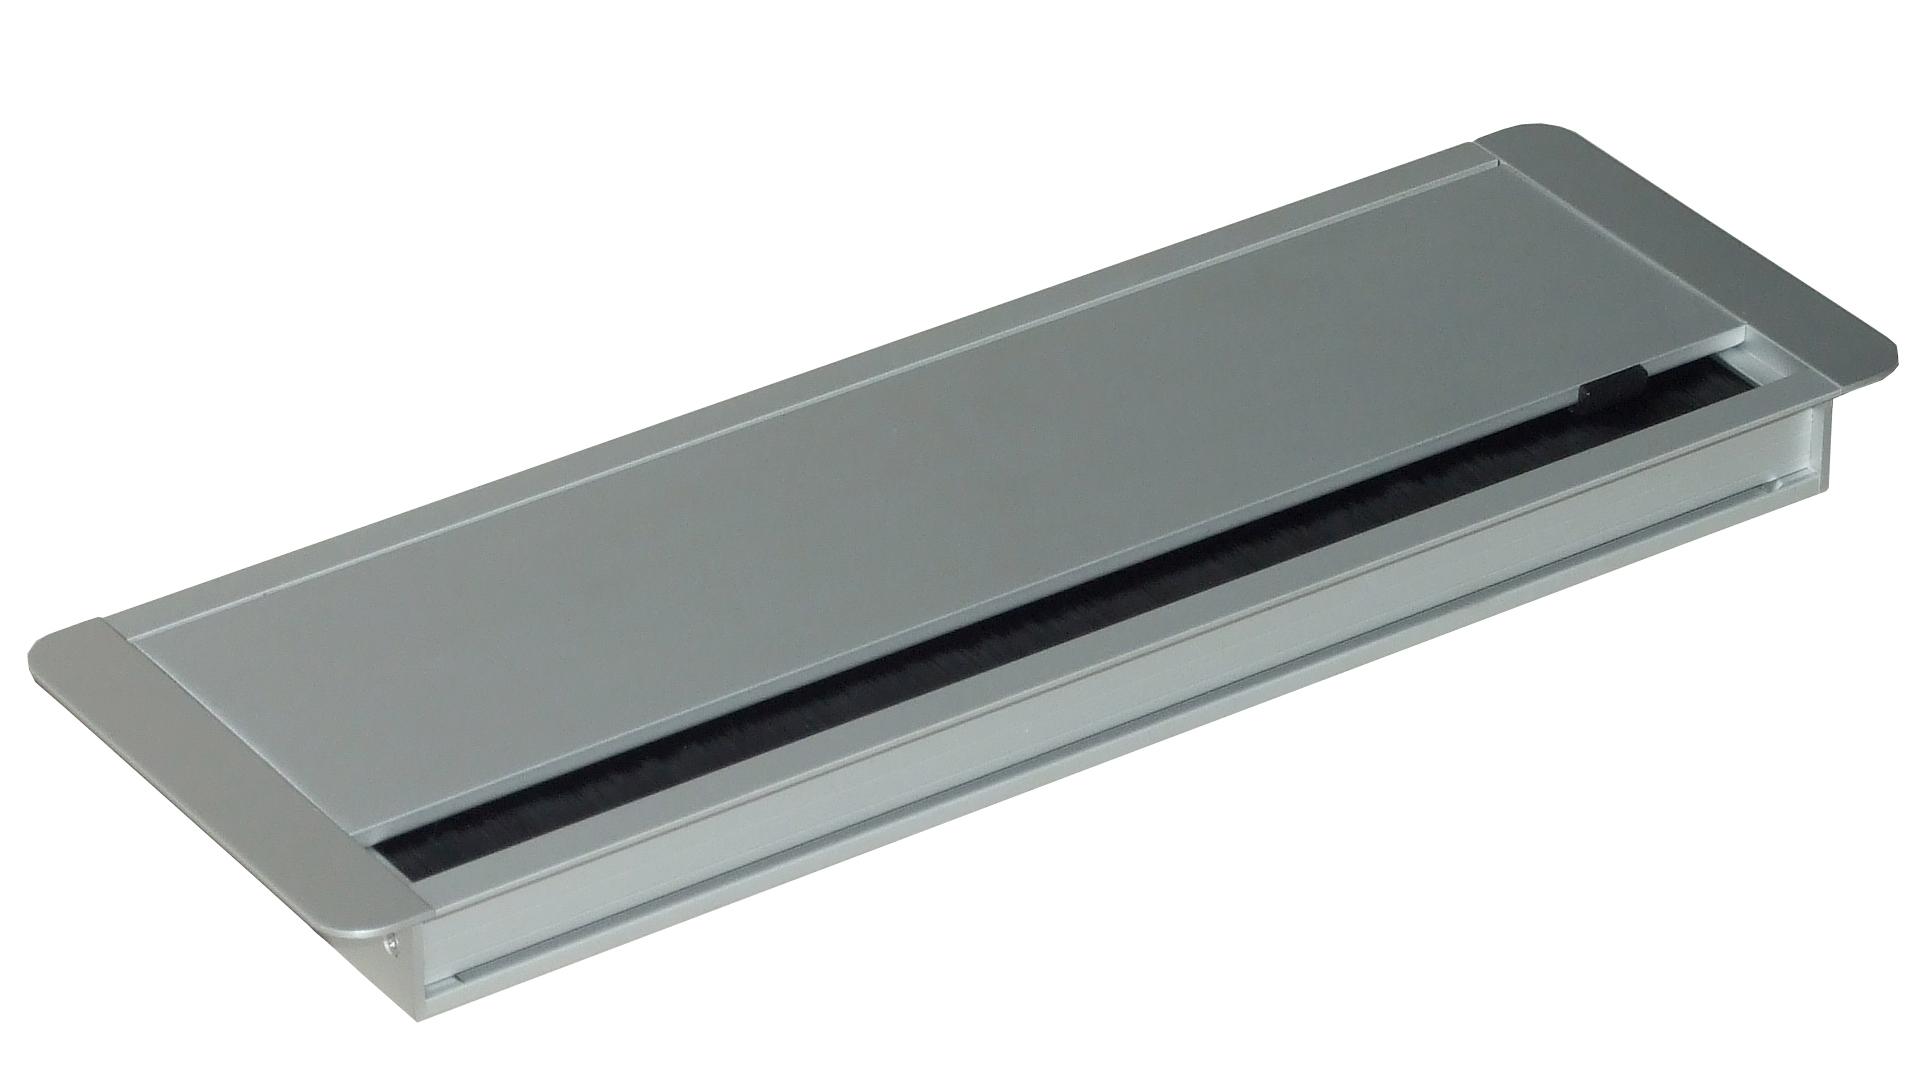 beschlaege online kabeldurchlass alu 120x360x25mm. Black Bedroom Furniture Sets. Home Design Ideas